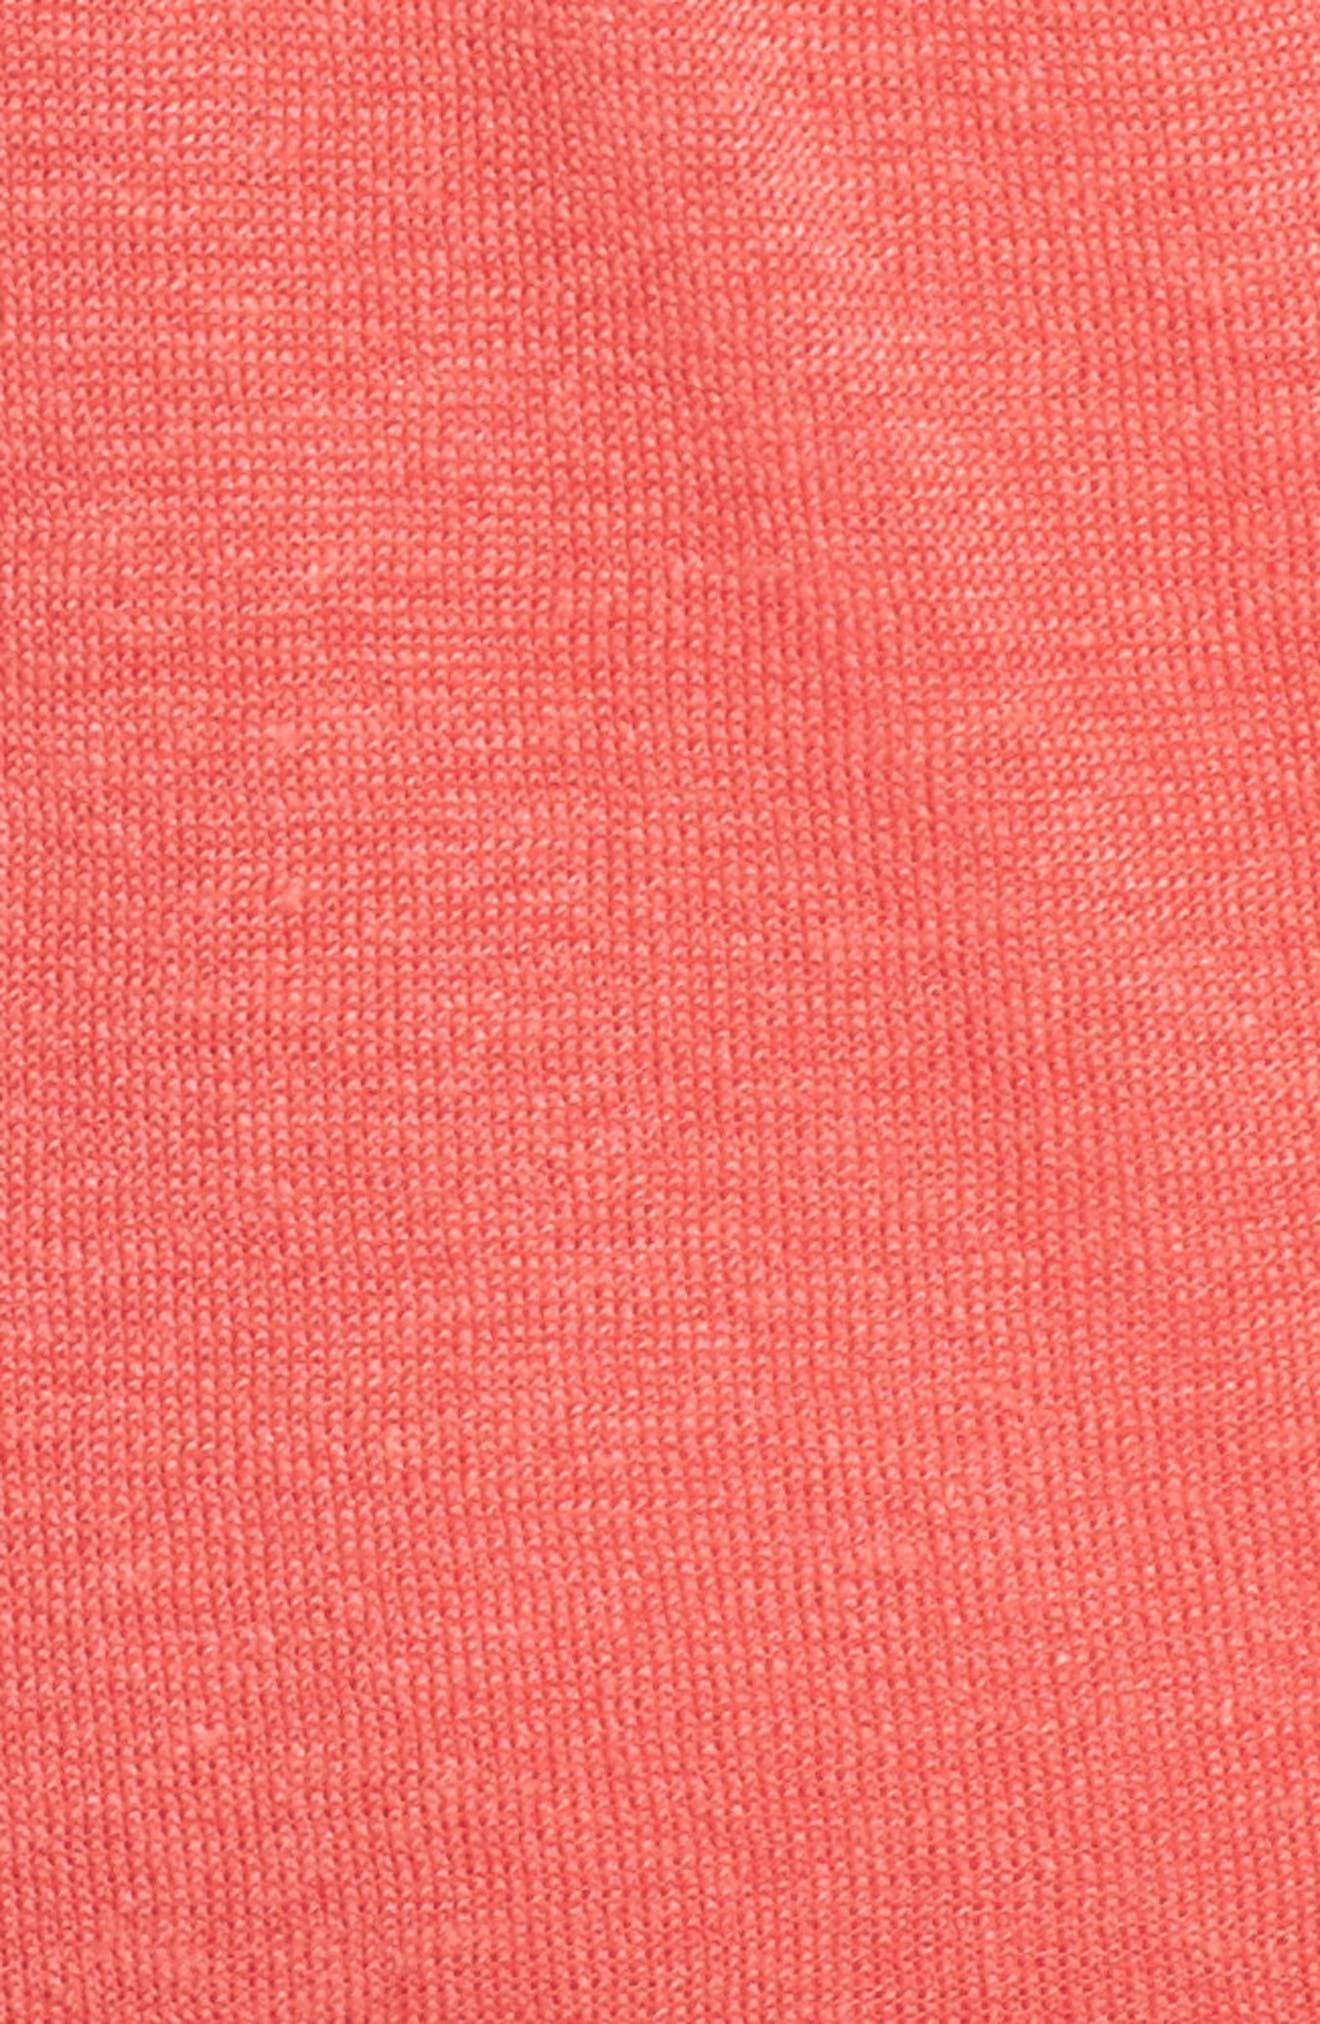 Four-Way Convertible Cardigan,                             Alternate thumbnail 5, color,                             CORAL CRUSH